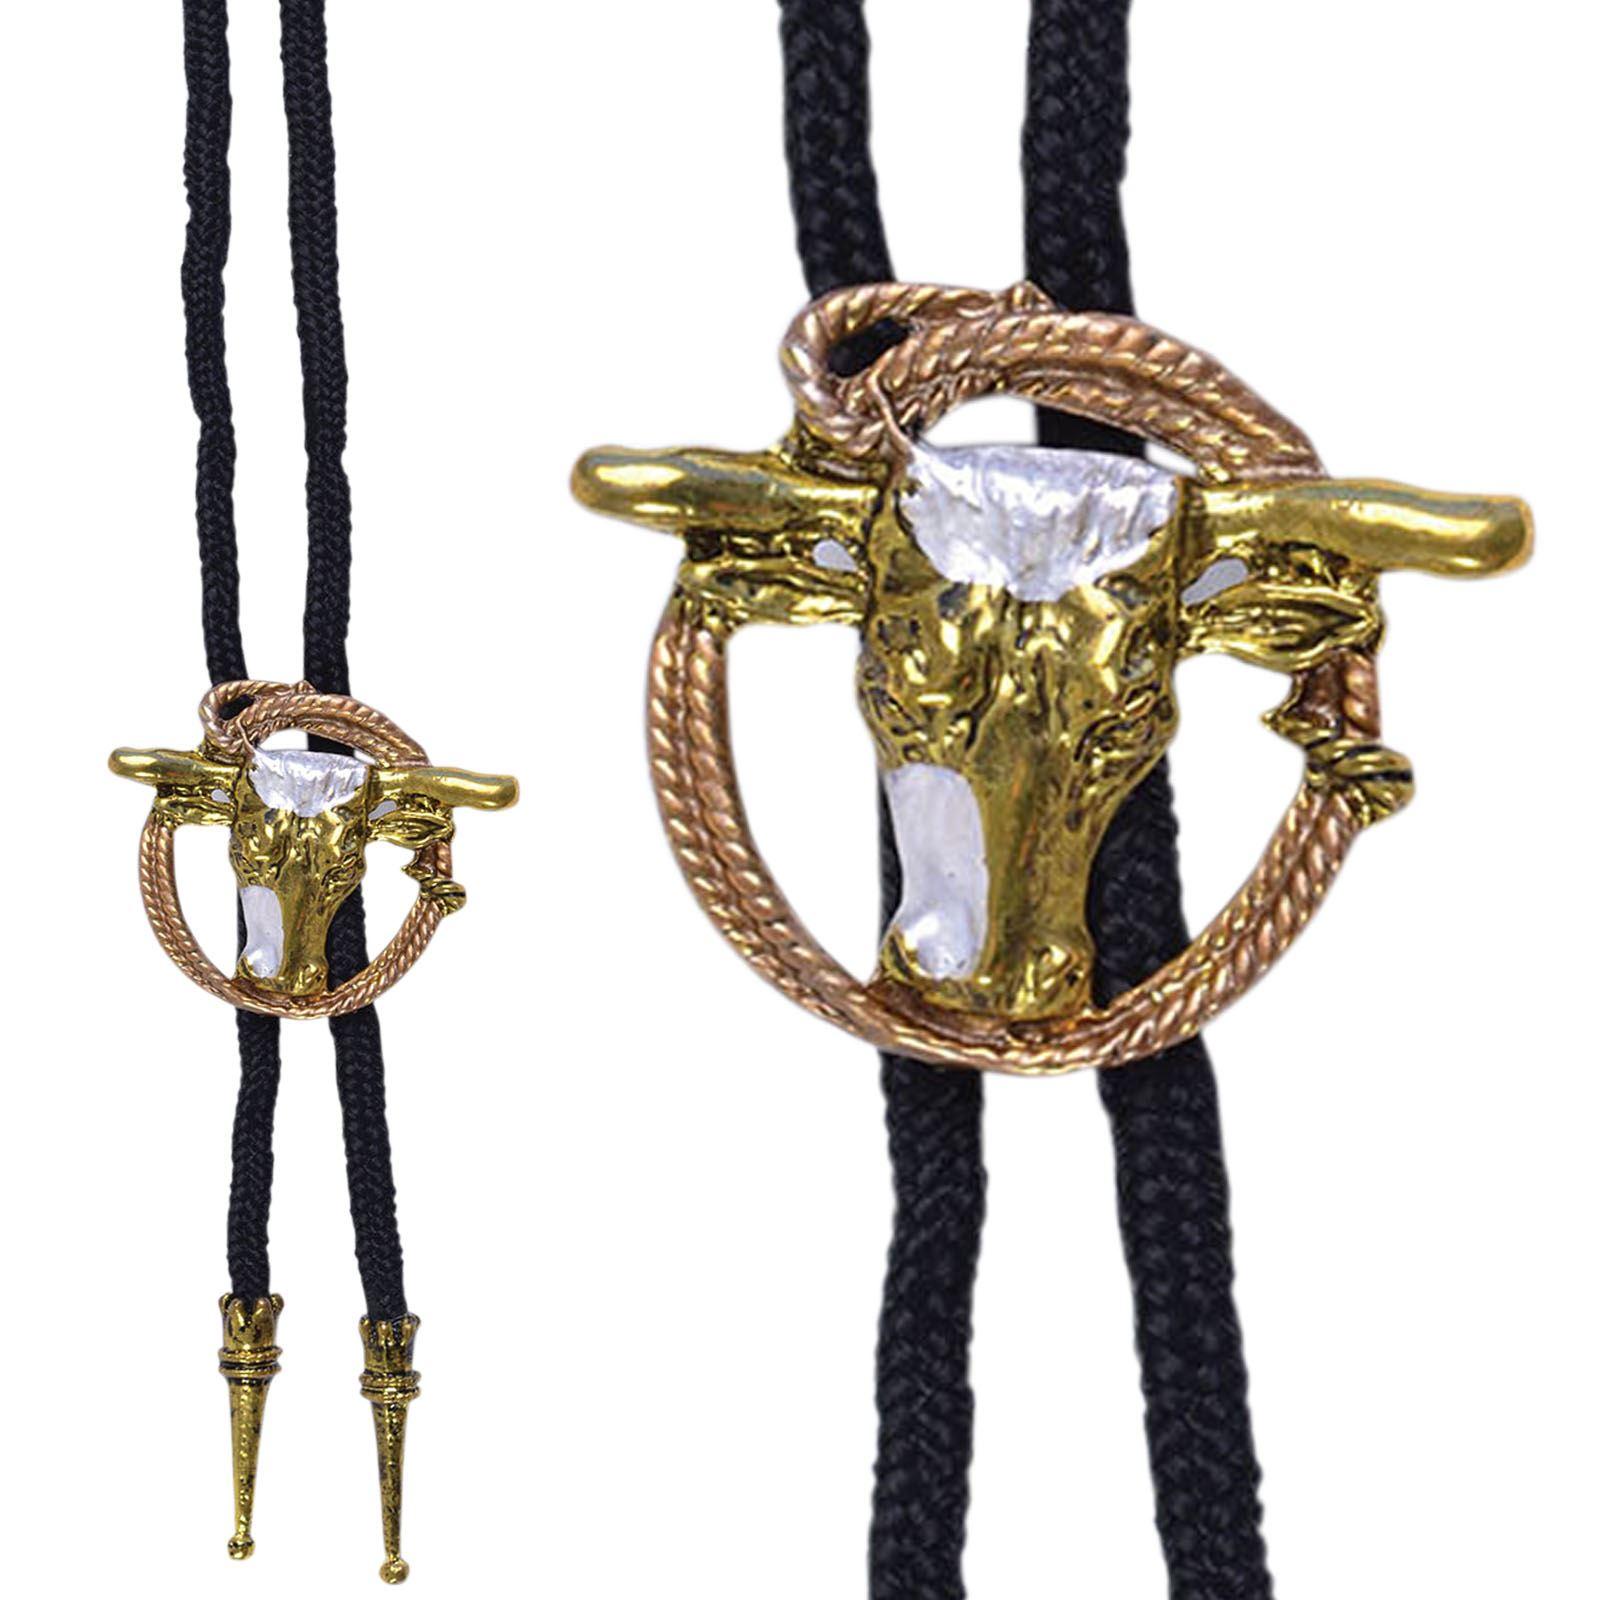 cowboy bootlace bolo tie fancy dress costume jewellery